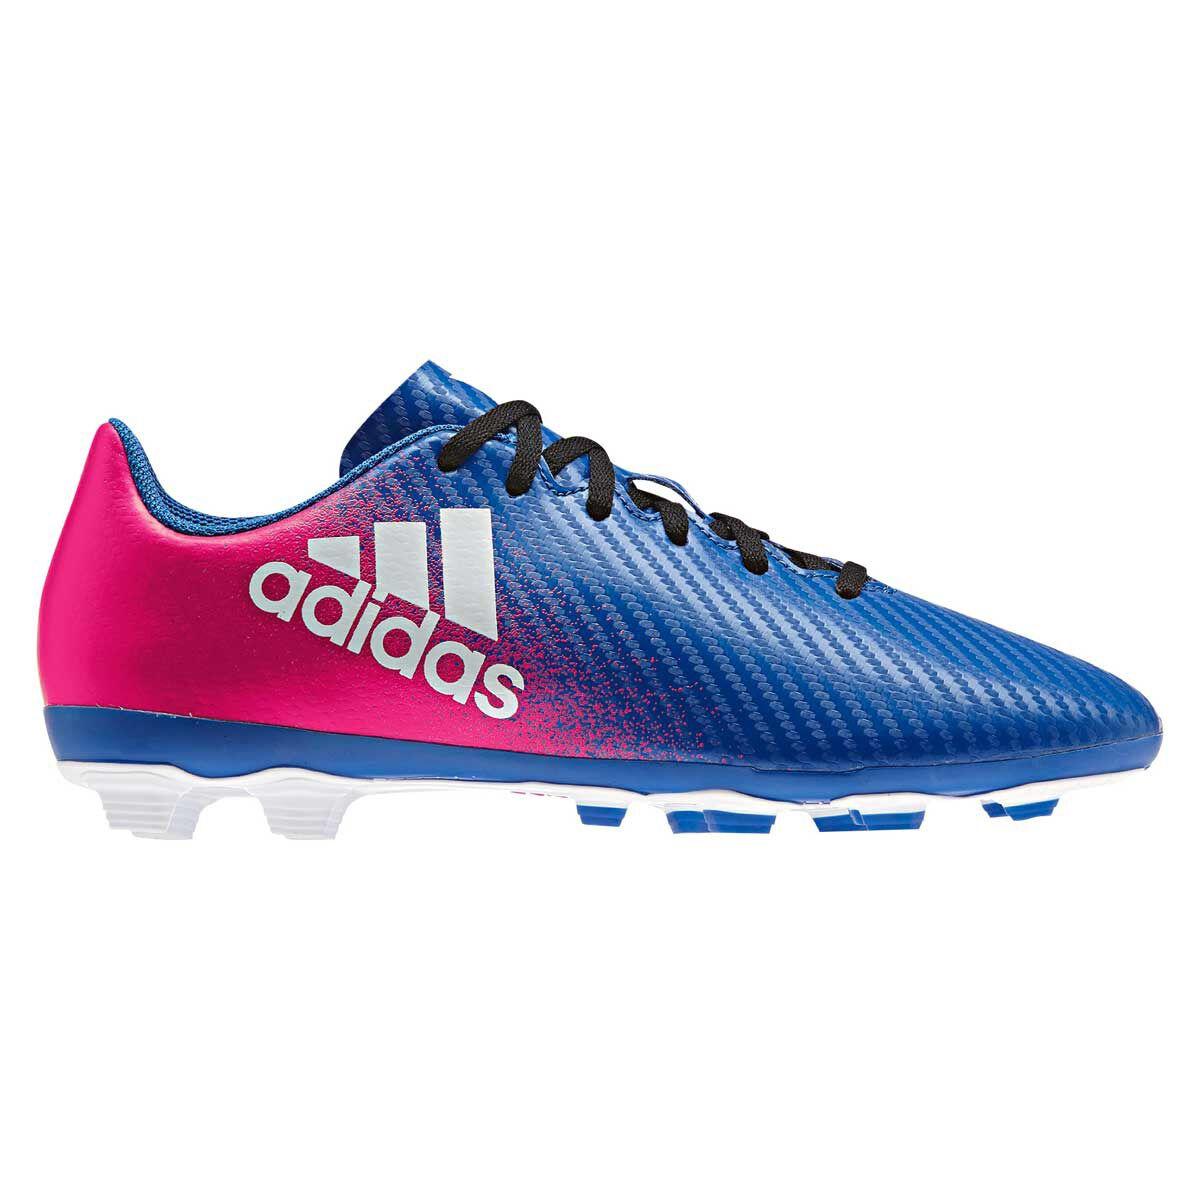 e0731a303aae ... clearance adidas x16.4 fxg junior football boots pink blue us 11 junior  pink 03aec